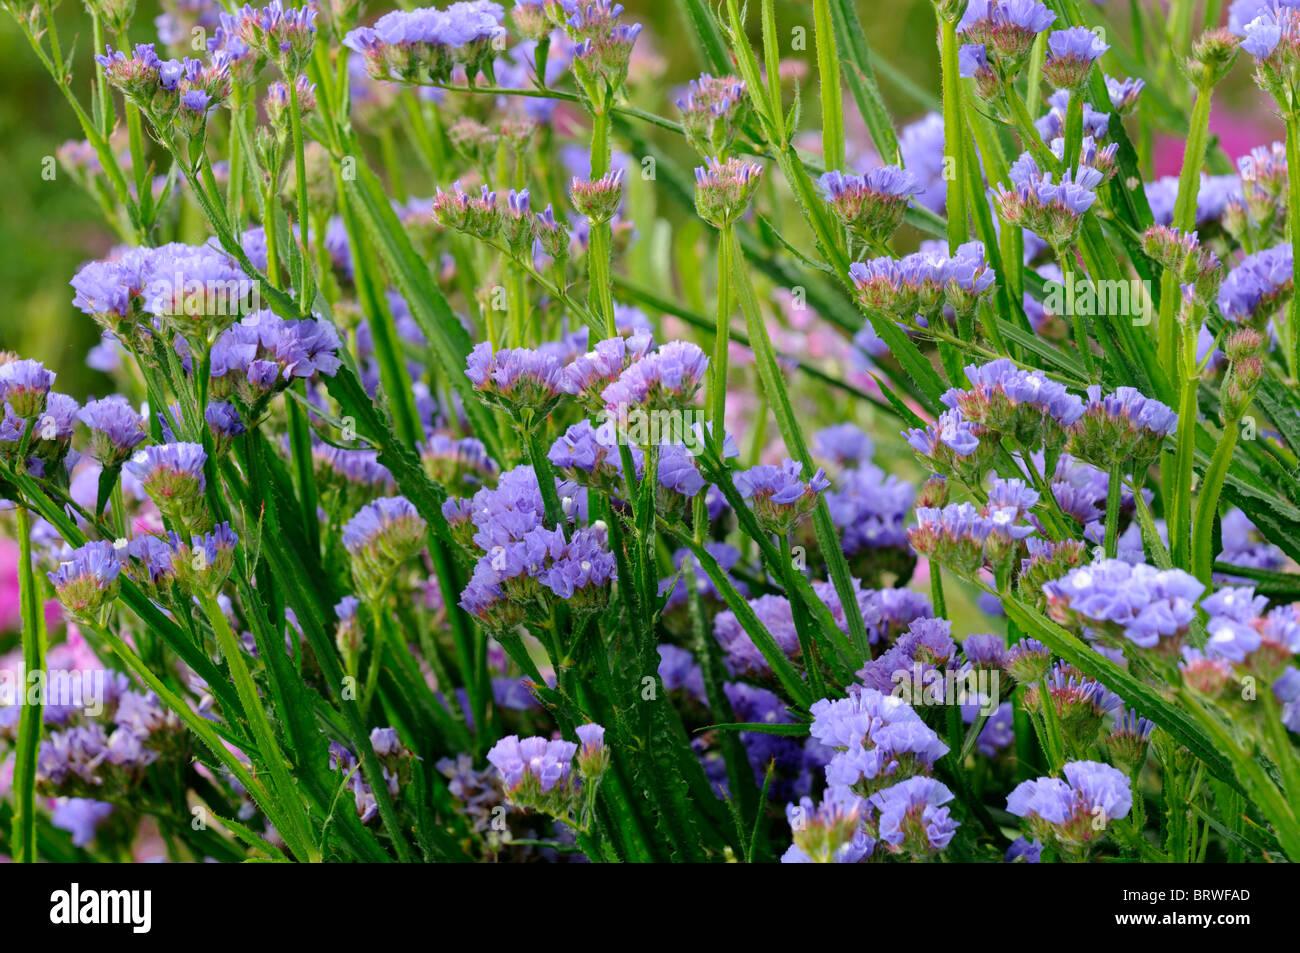 Statice sinuata Sunburst pale blue Limonium flowers bloom blossom Stock